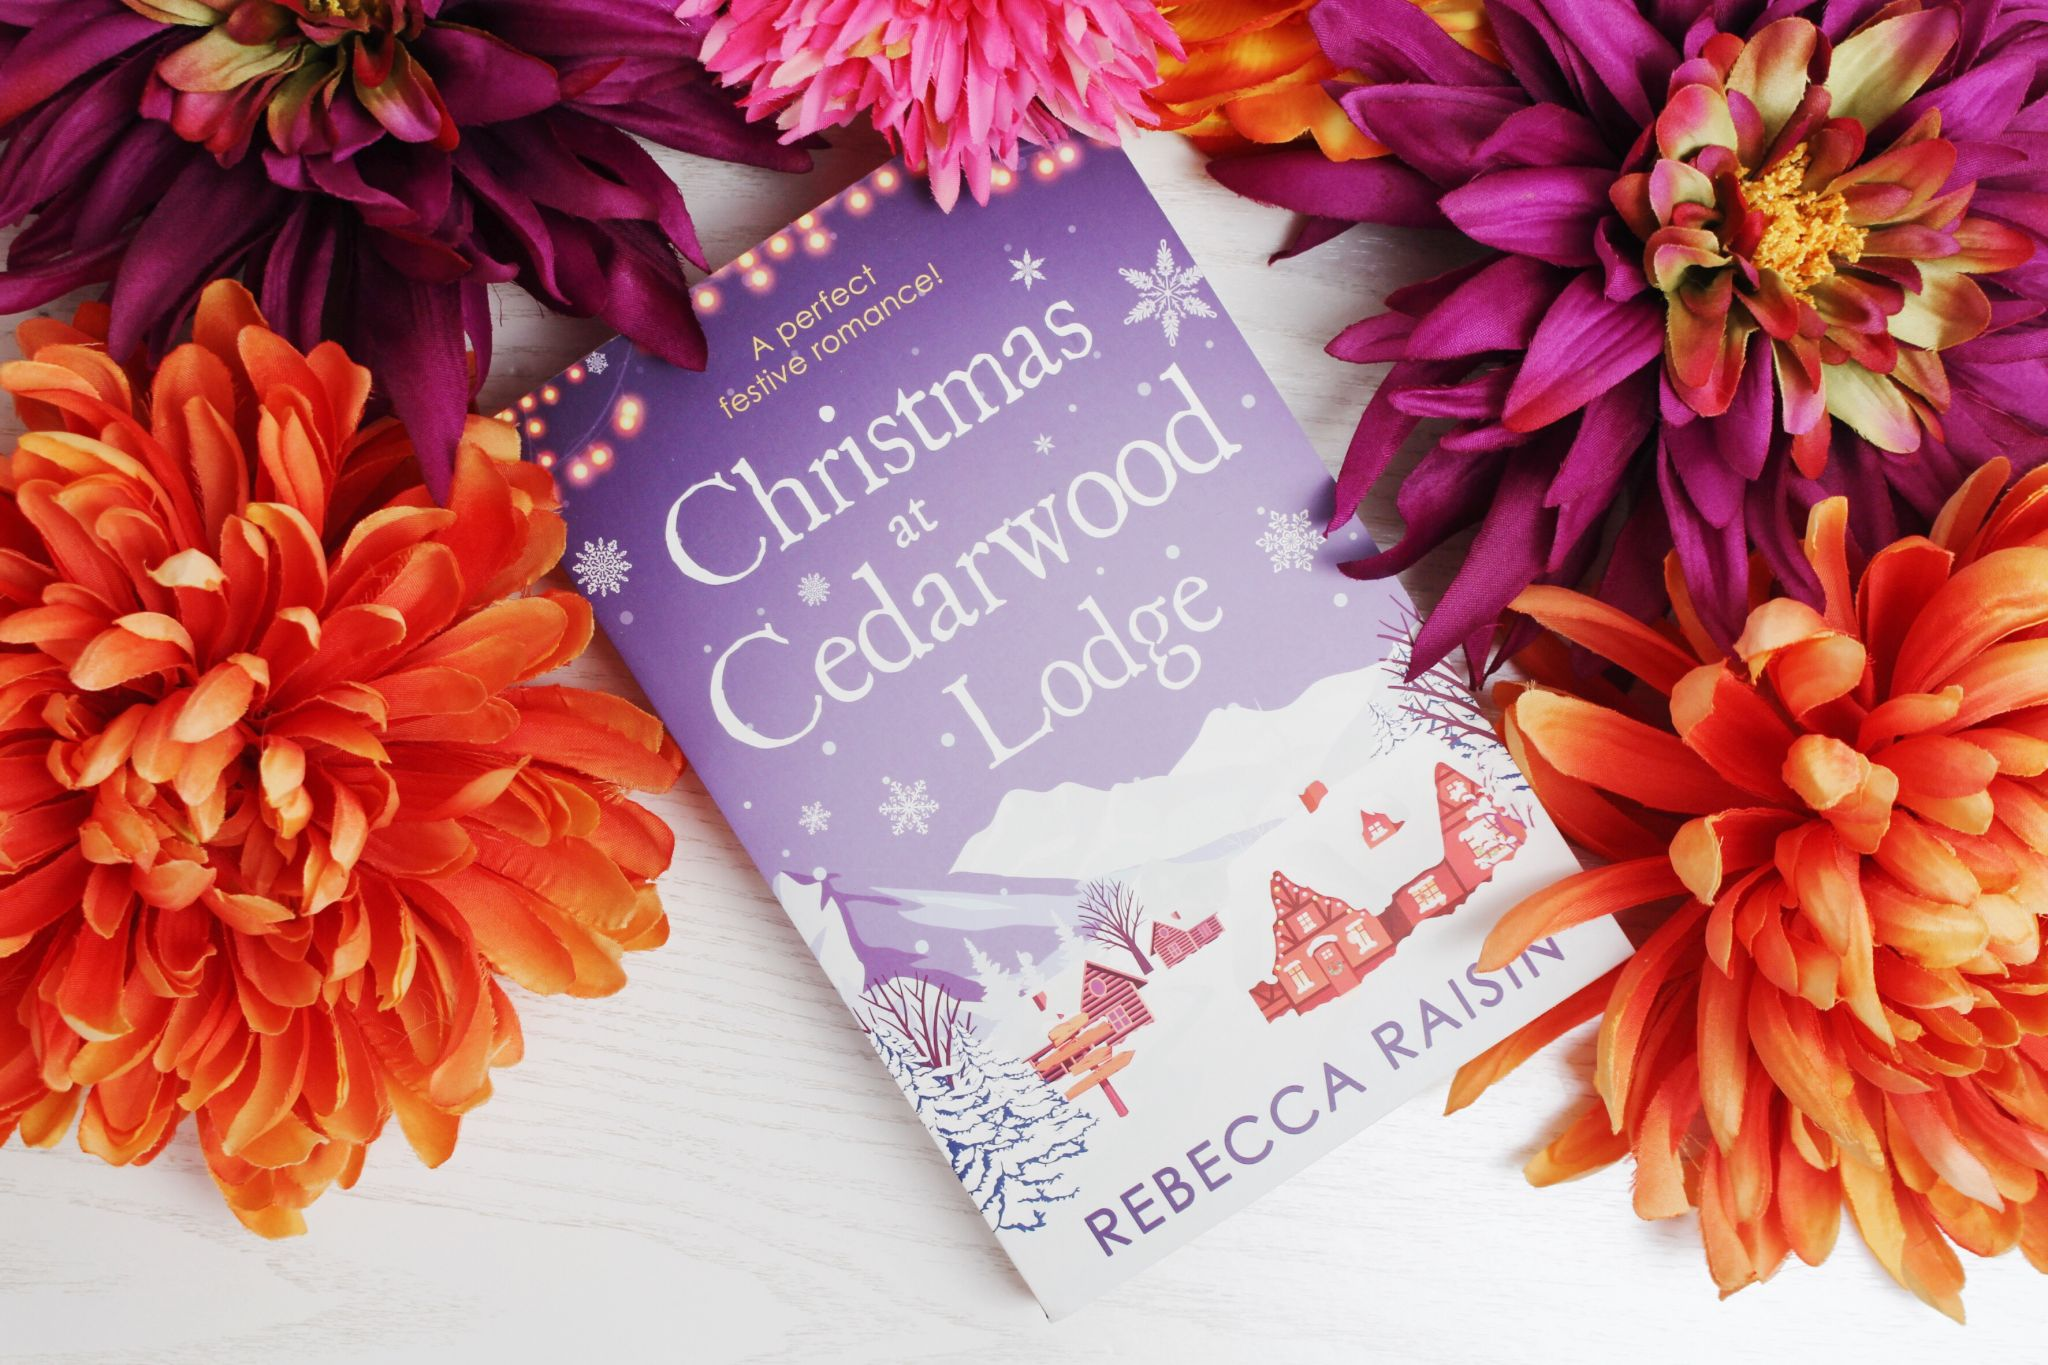 ClemLovesCedarwood